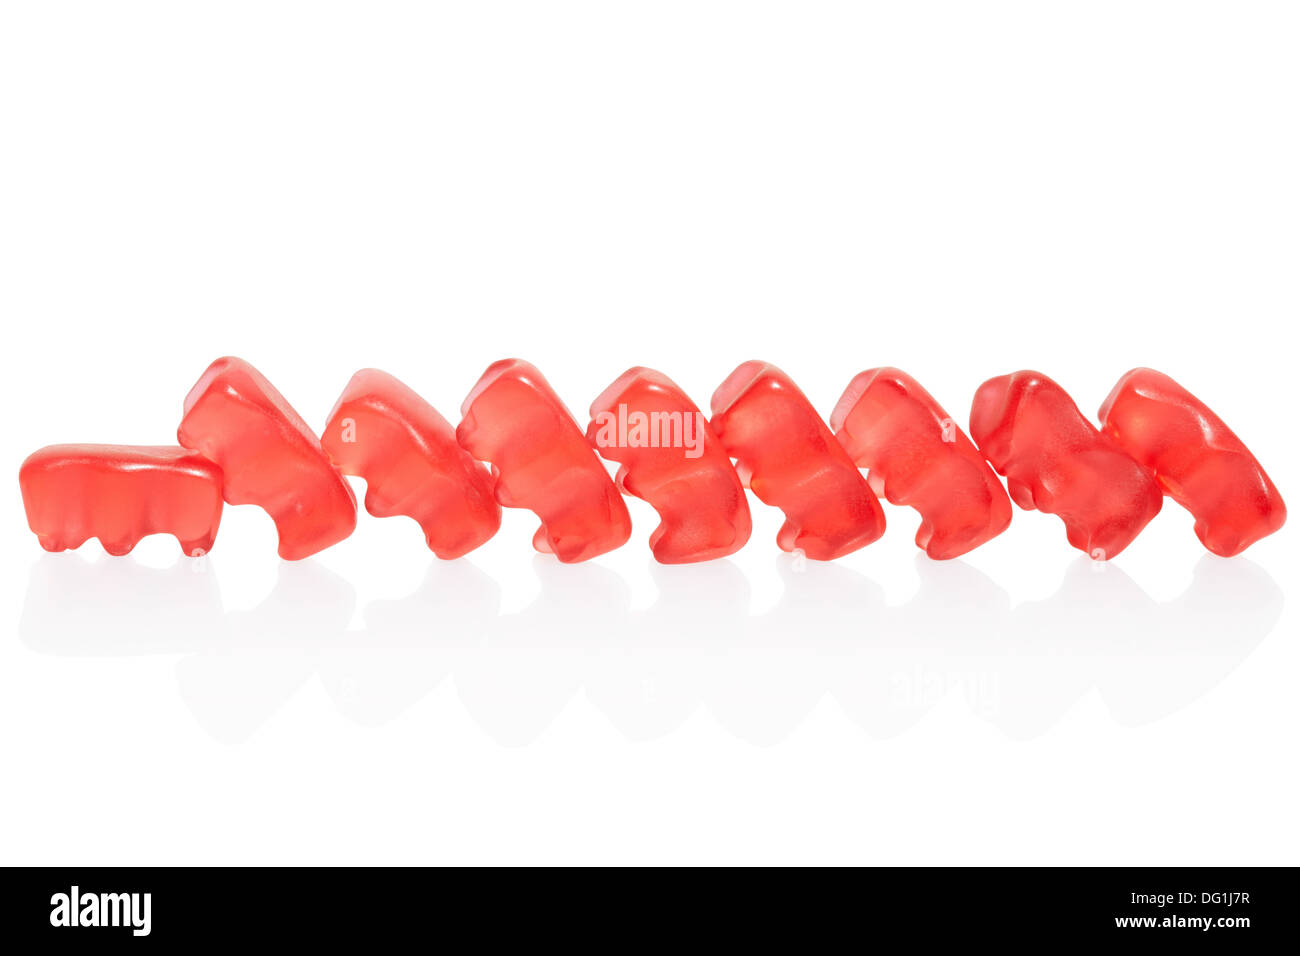 Gummy bears domino effect - Stock Image